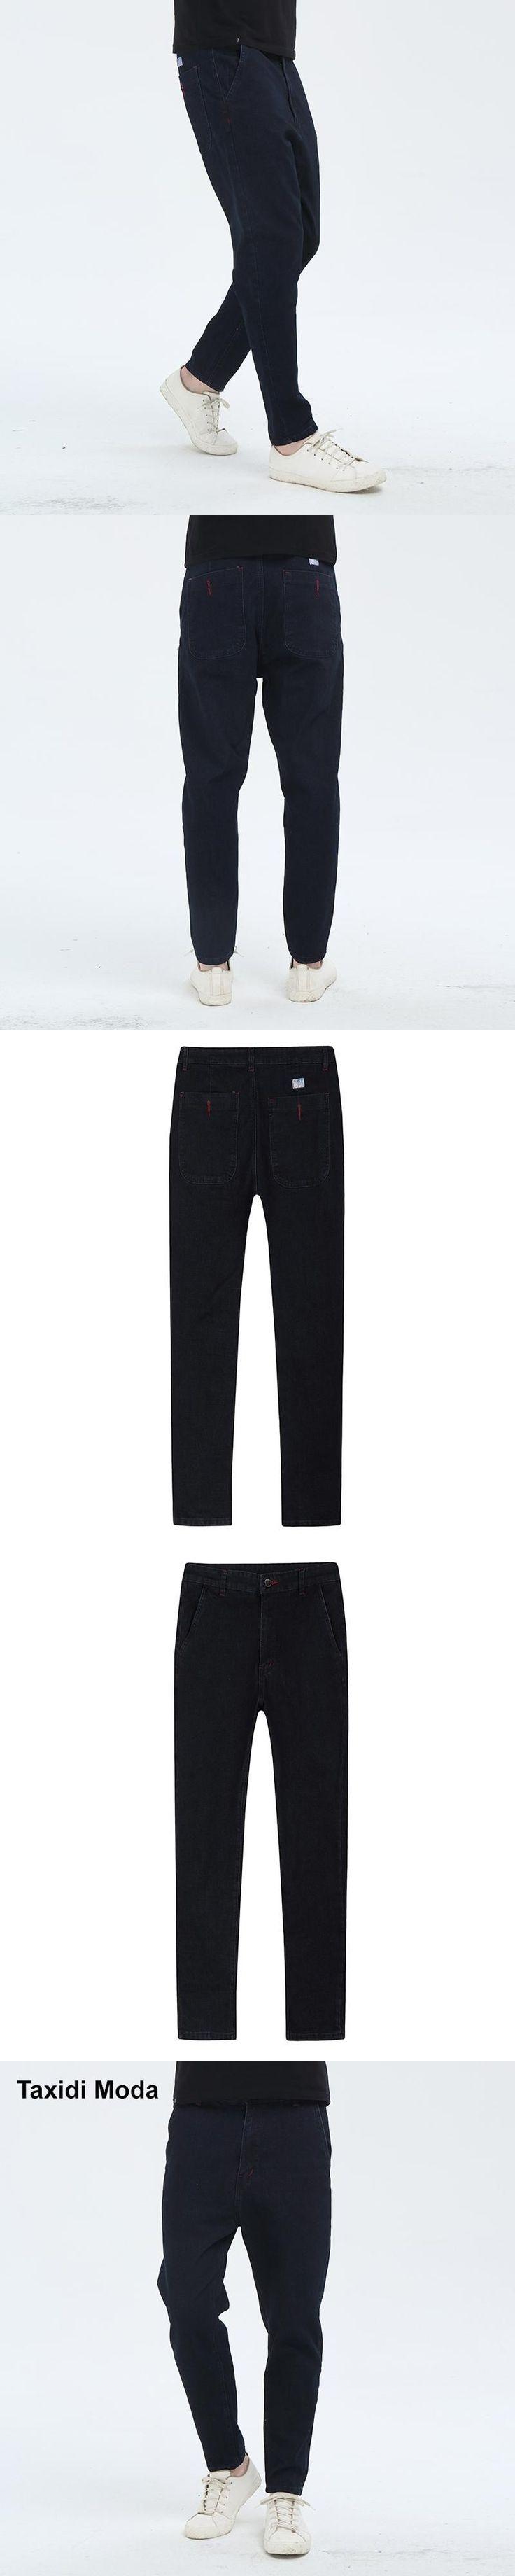 Taxidi Moda 2017 Autumn Mens Casual Denim Pants Blue Black Brand Clothing For Man's Slim Fit Harem Jeans Male Wear Trousers 5082